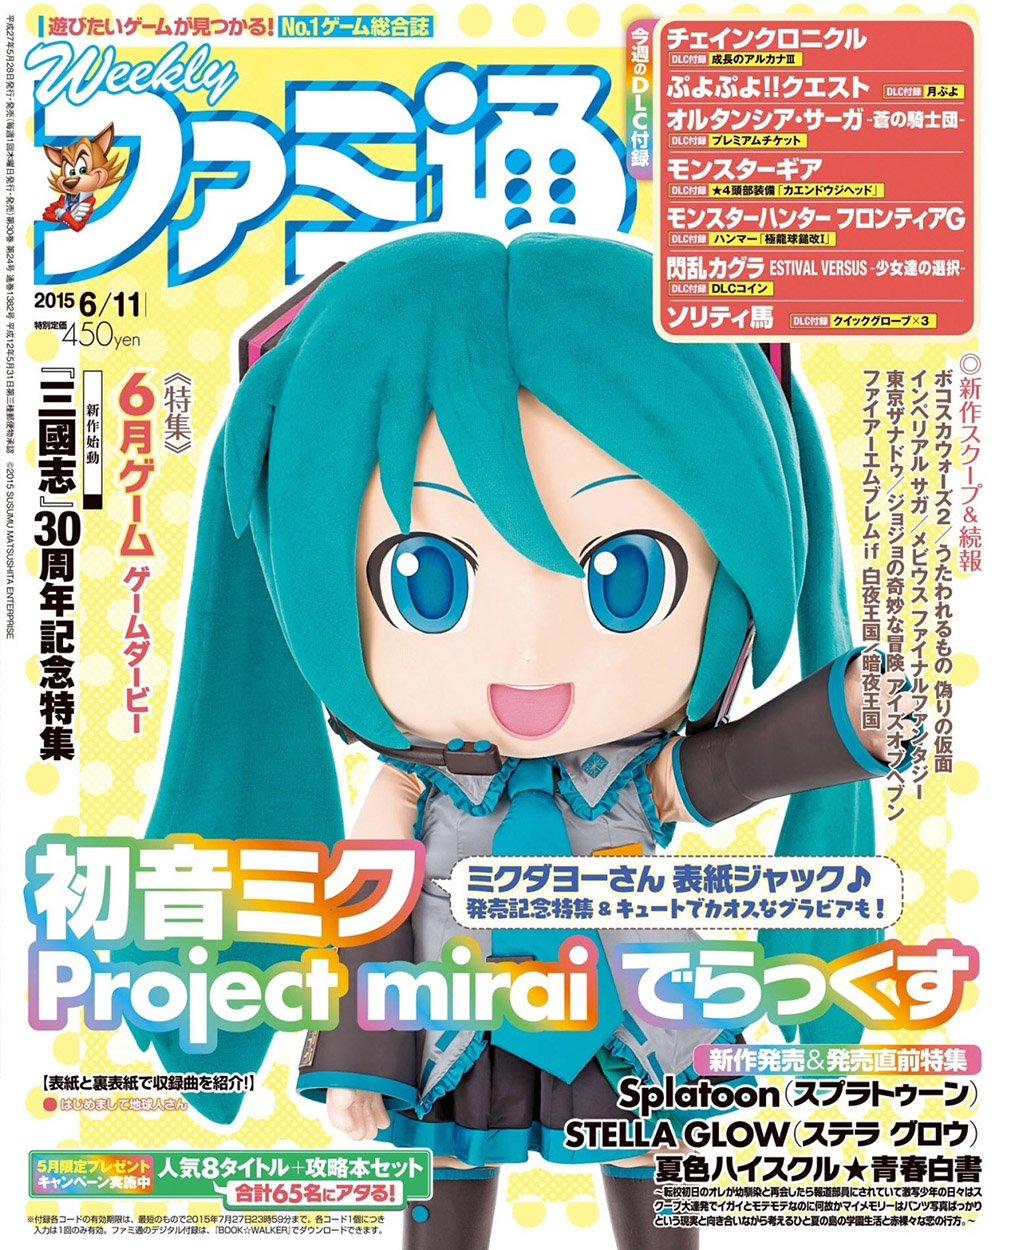 Famitsu 1382 June 11, 2015